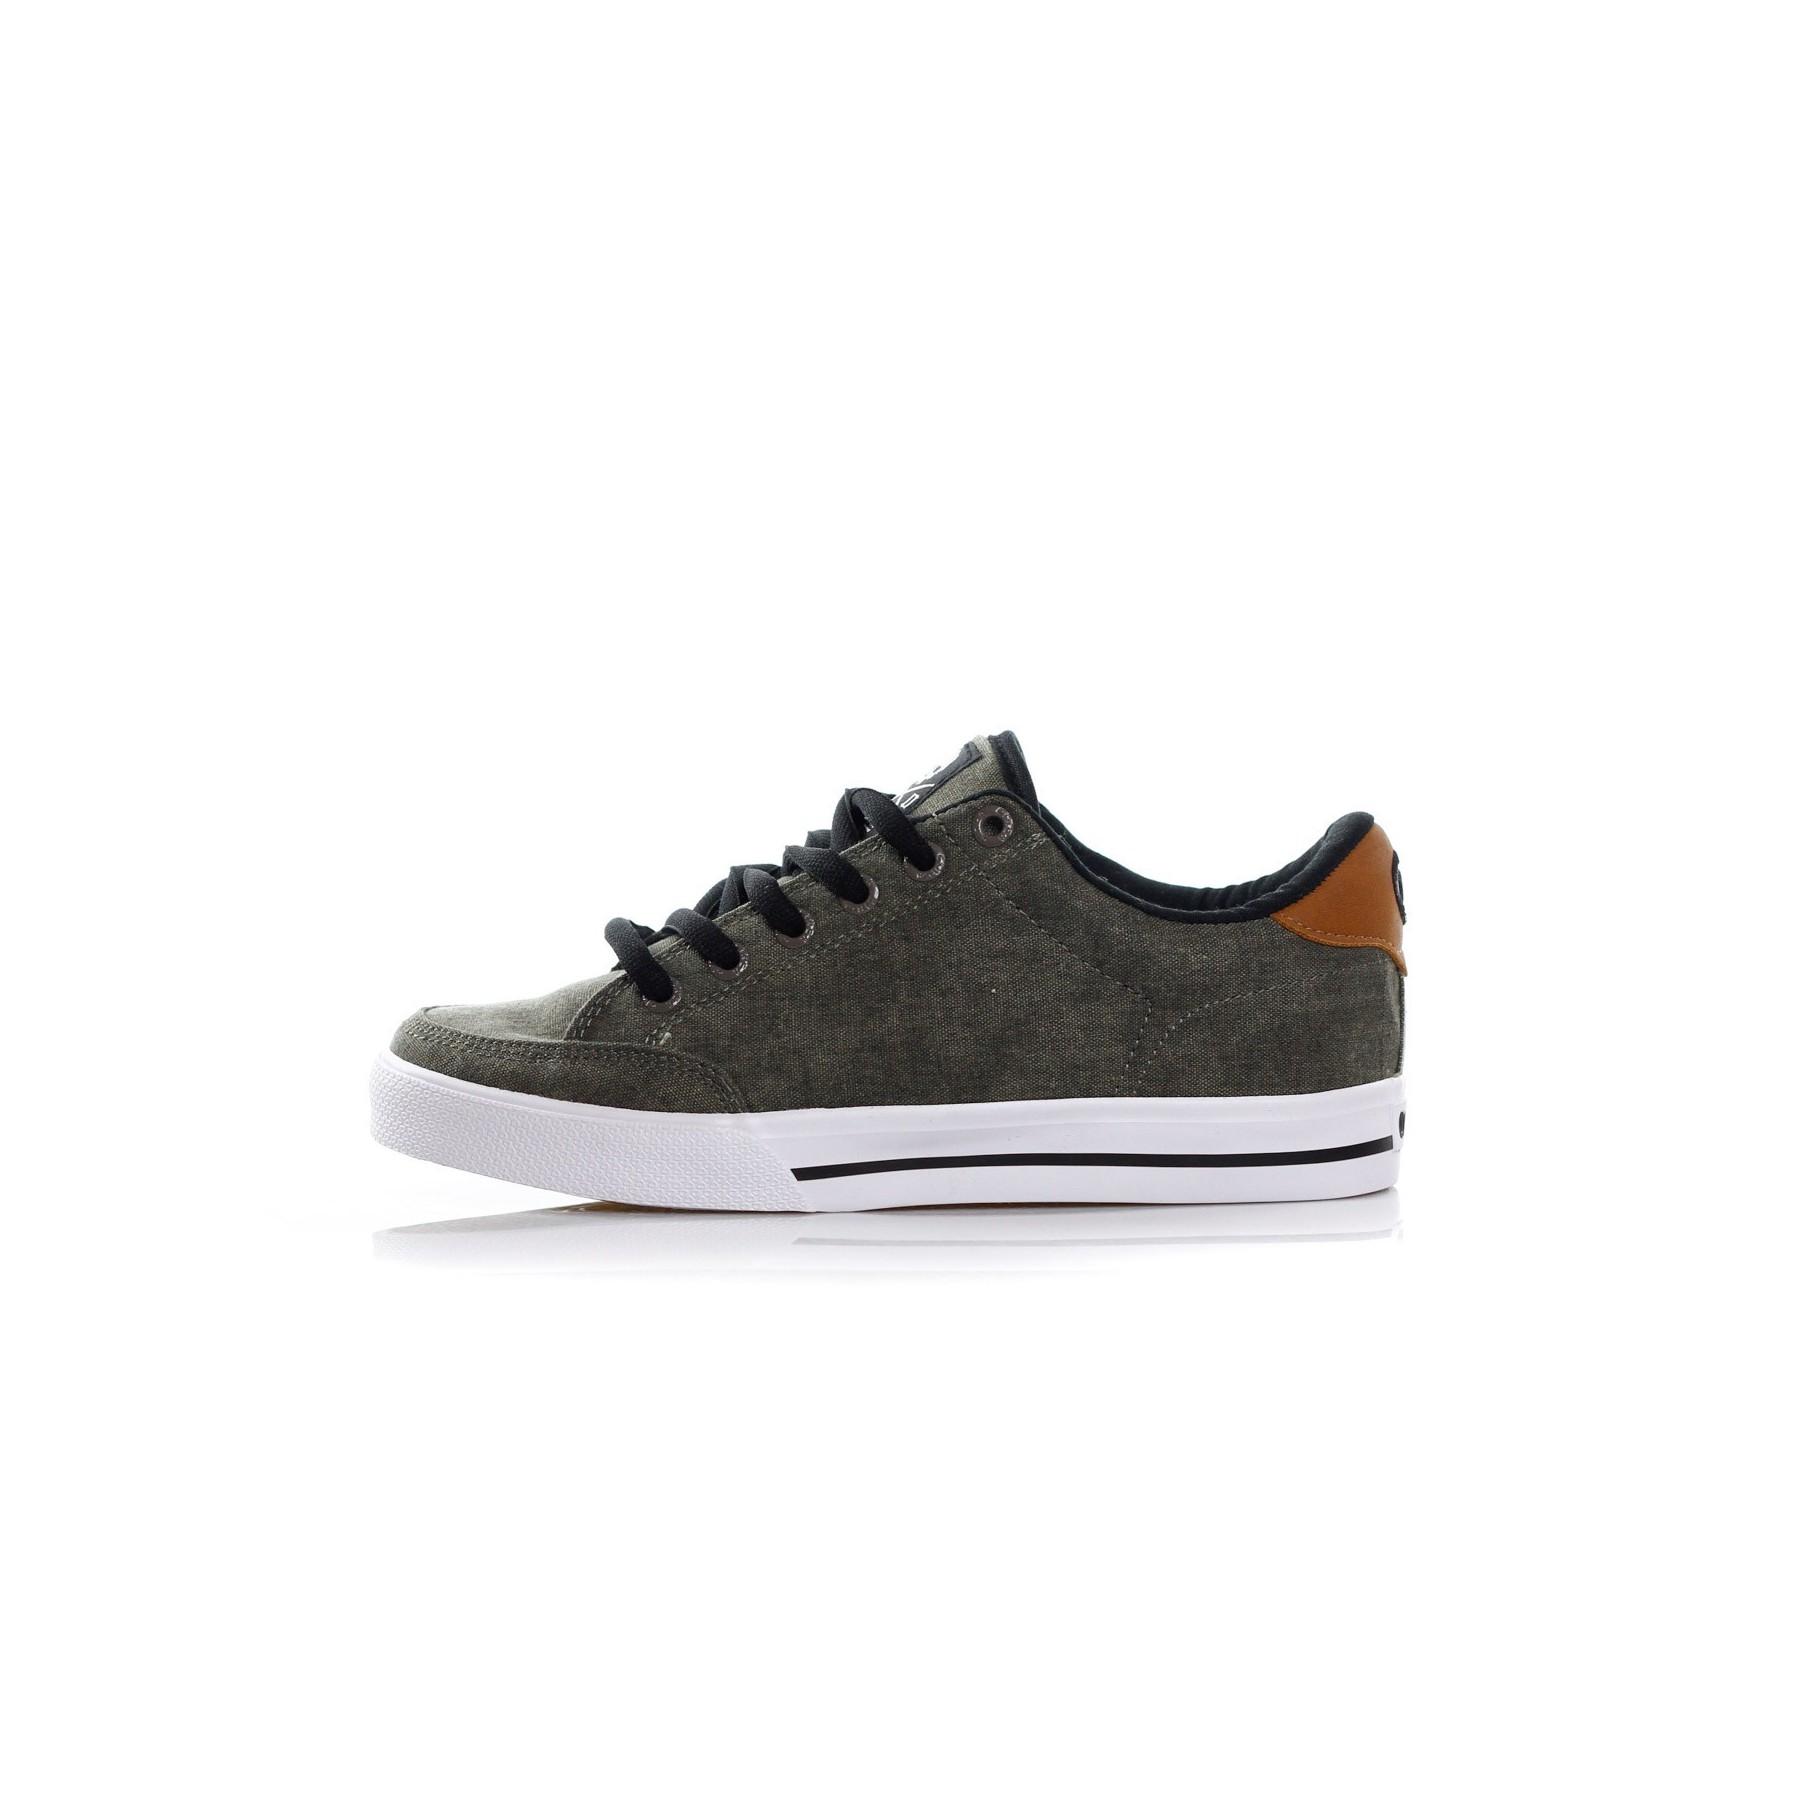 separation shoes 1f3d1 e283a SCARPE SKATE LOPEZ 50 BUNGEE CORD/WHITE   Atipicishop.com